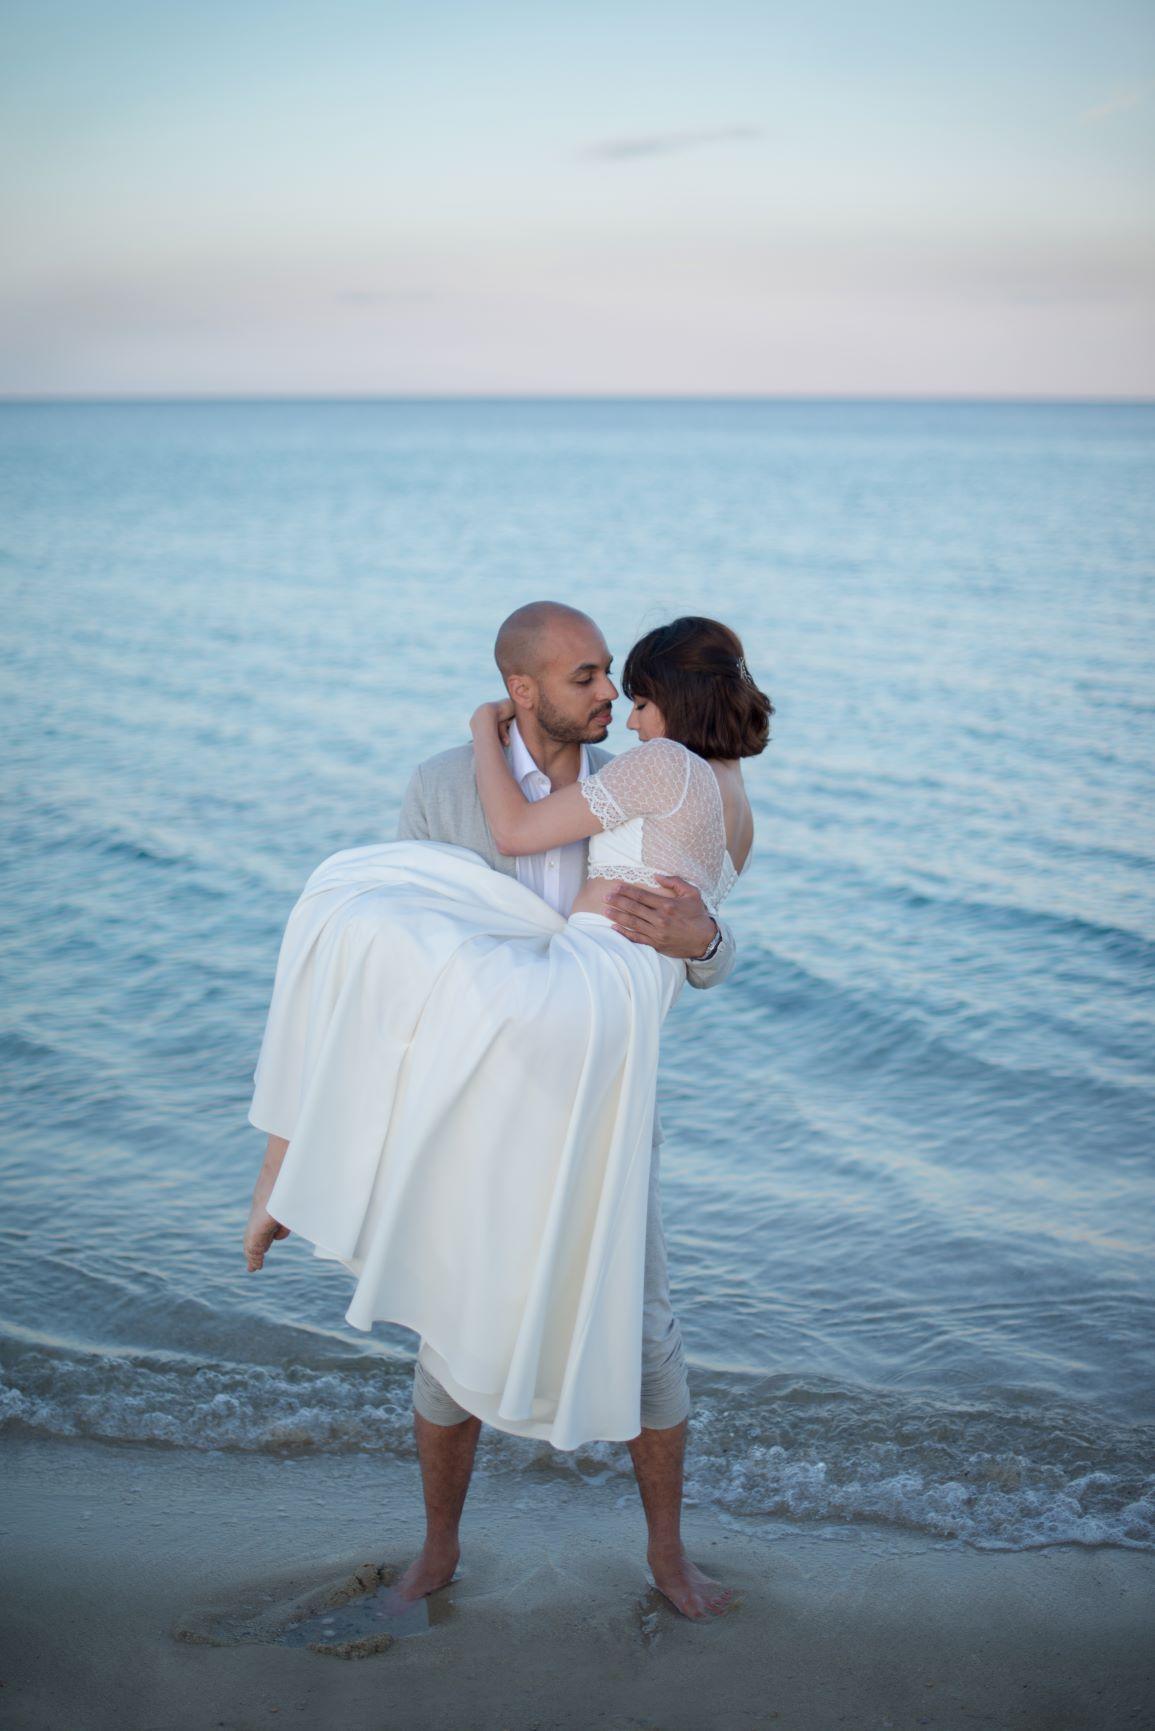 Mariage-cotedazur-Sainttropez-EmmanuelleMartyphotographe-148red